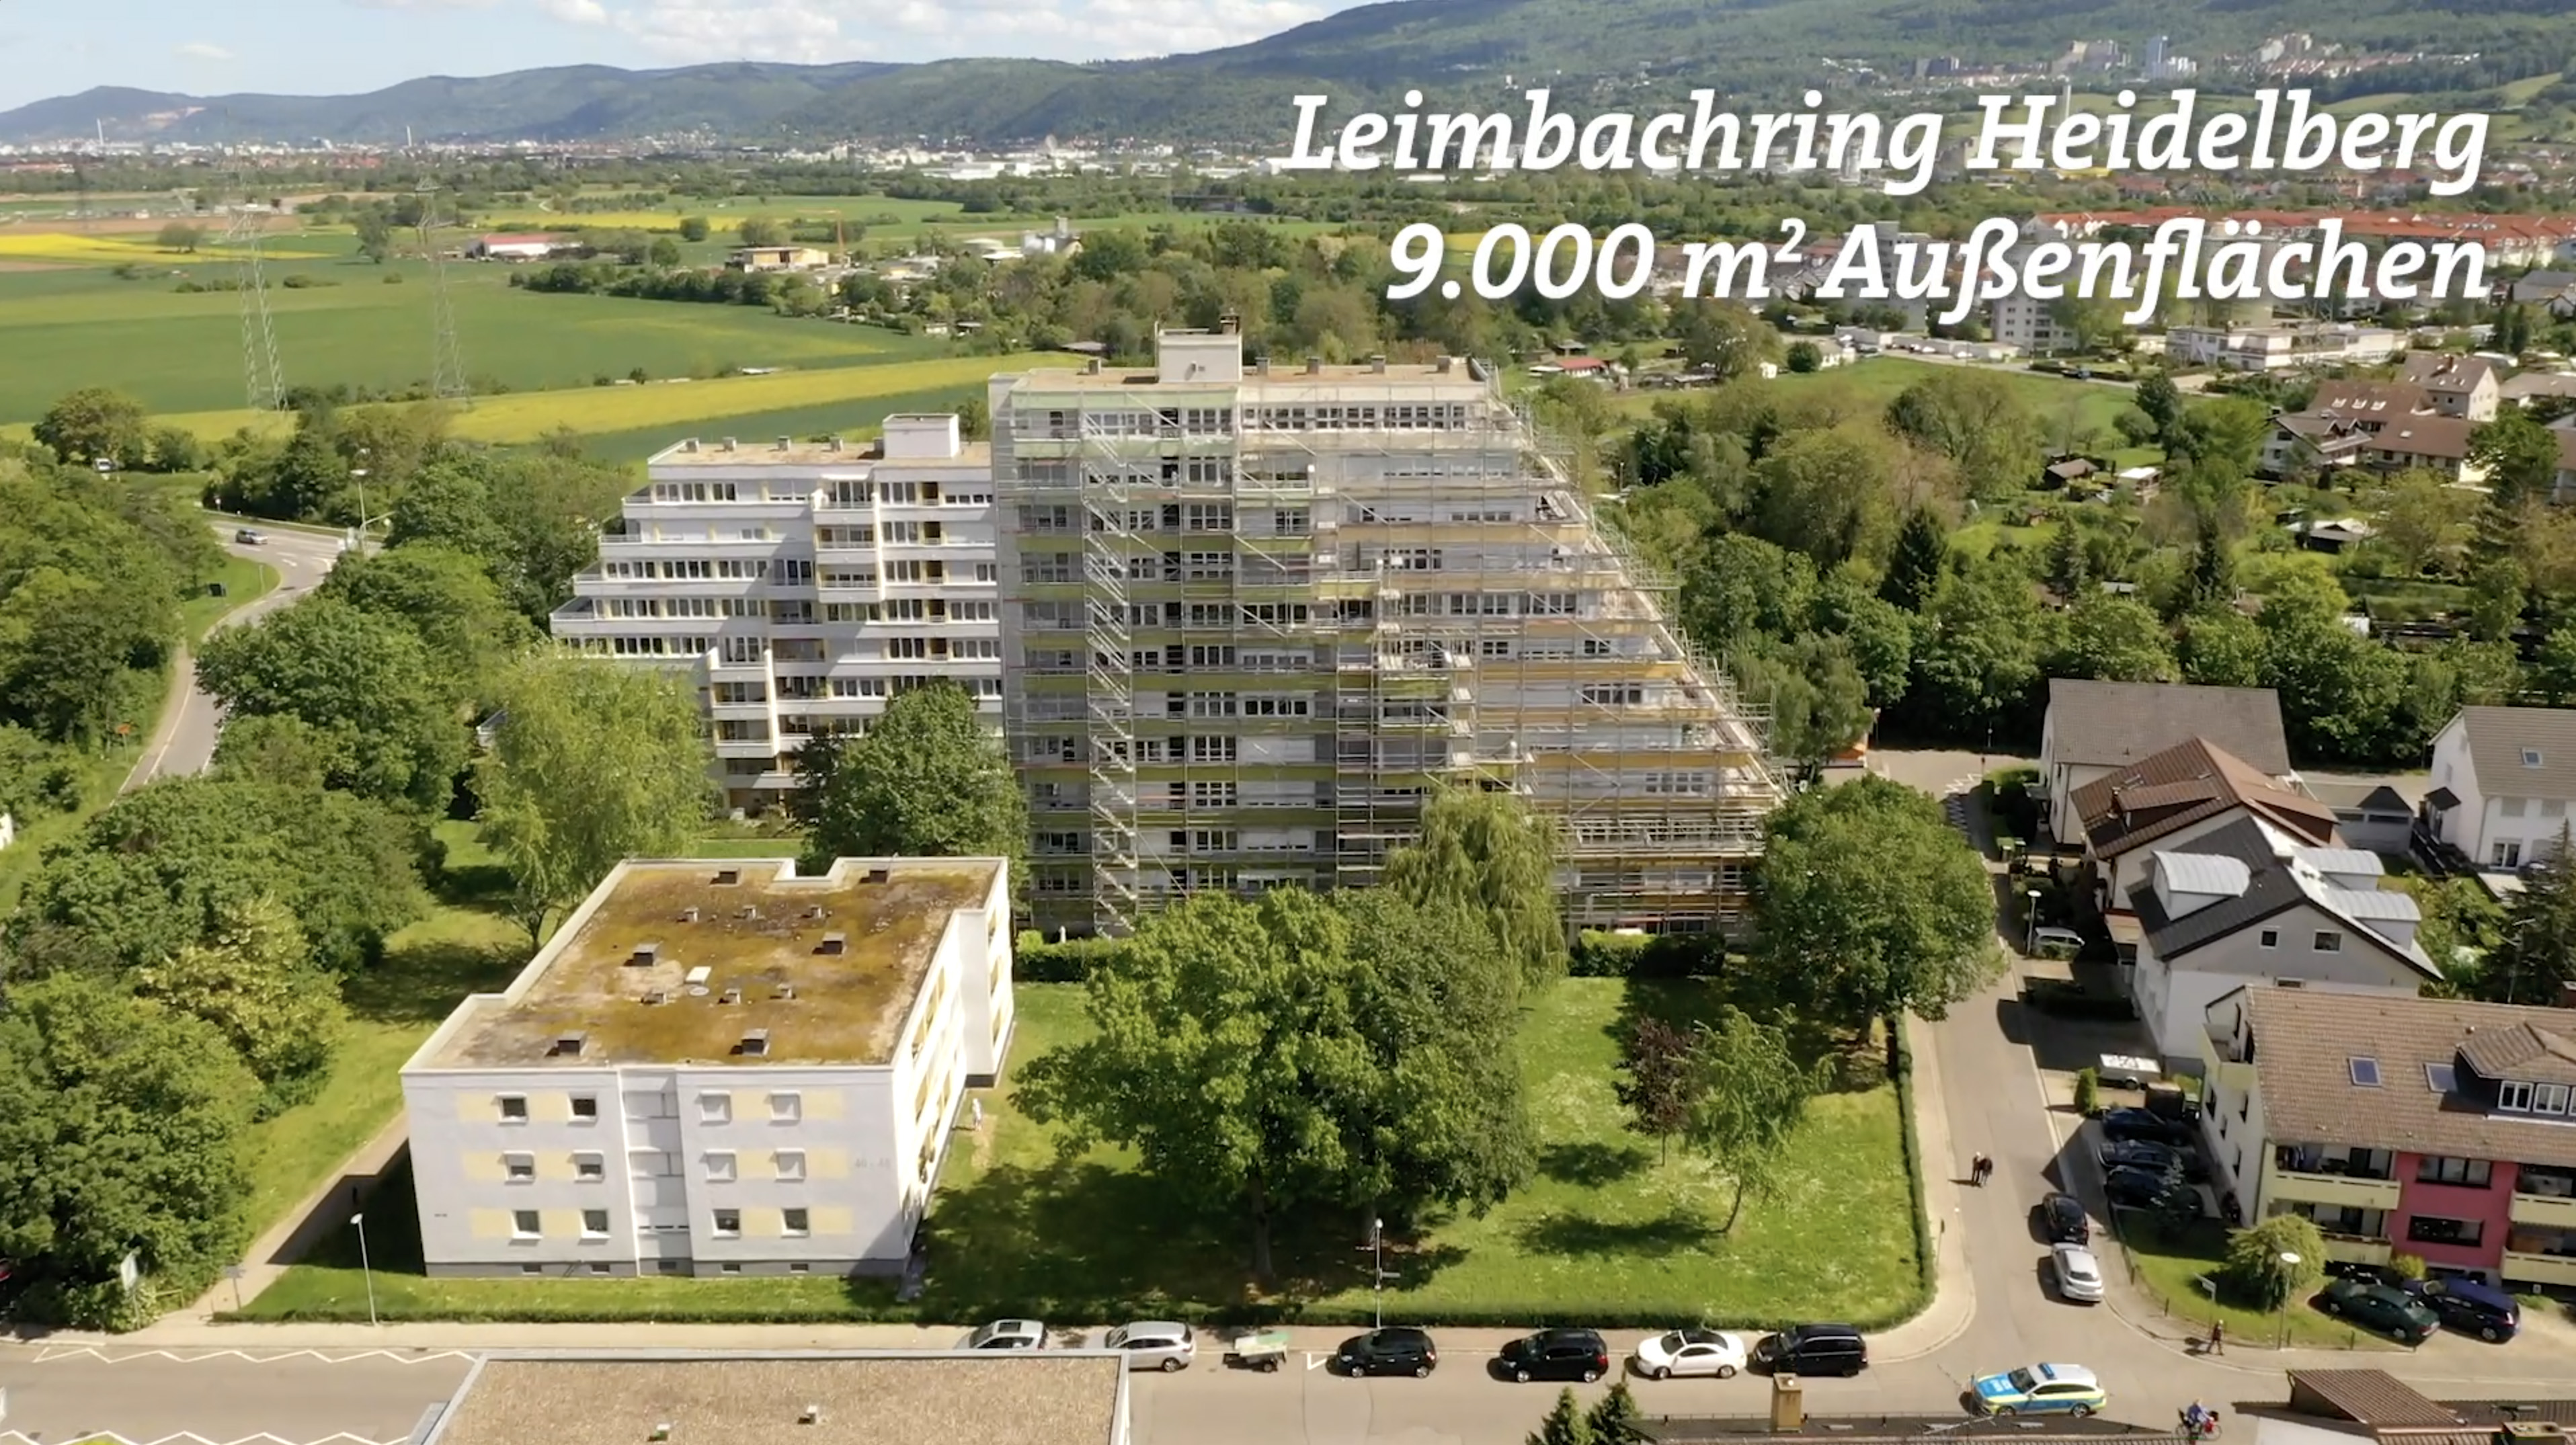 Leimbach Ring Heidelberg